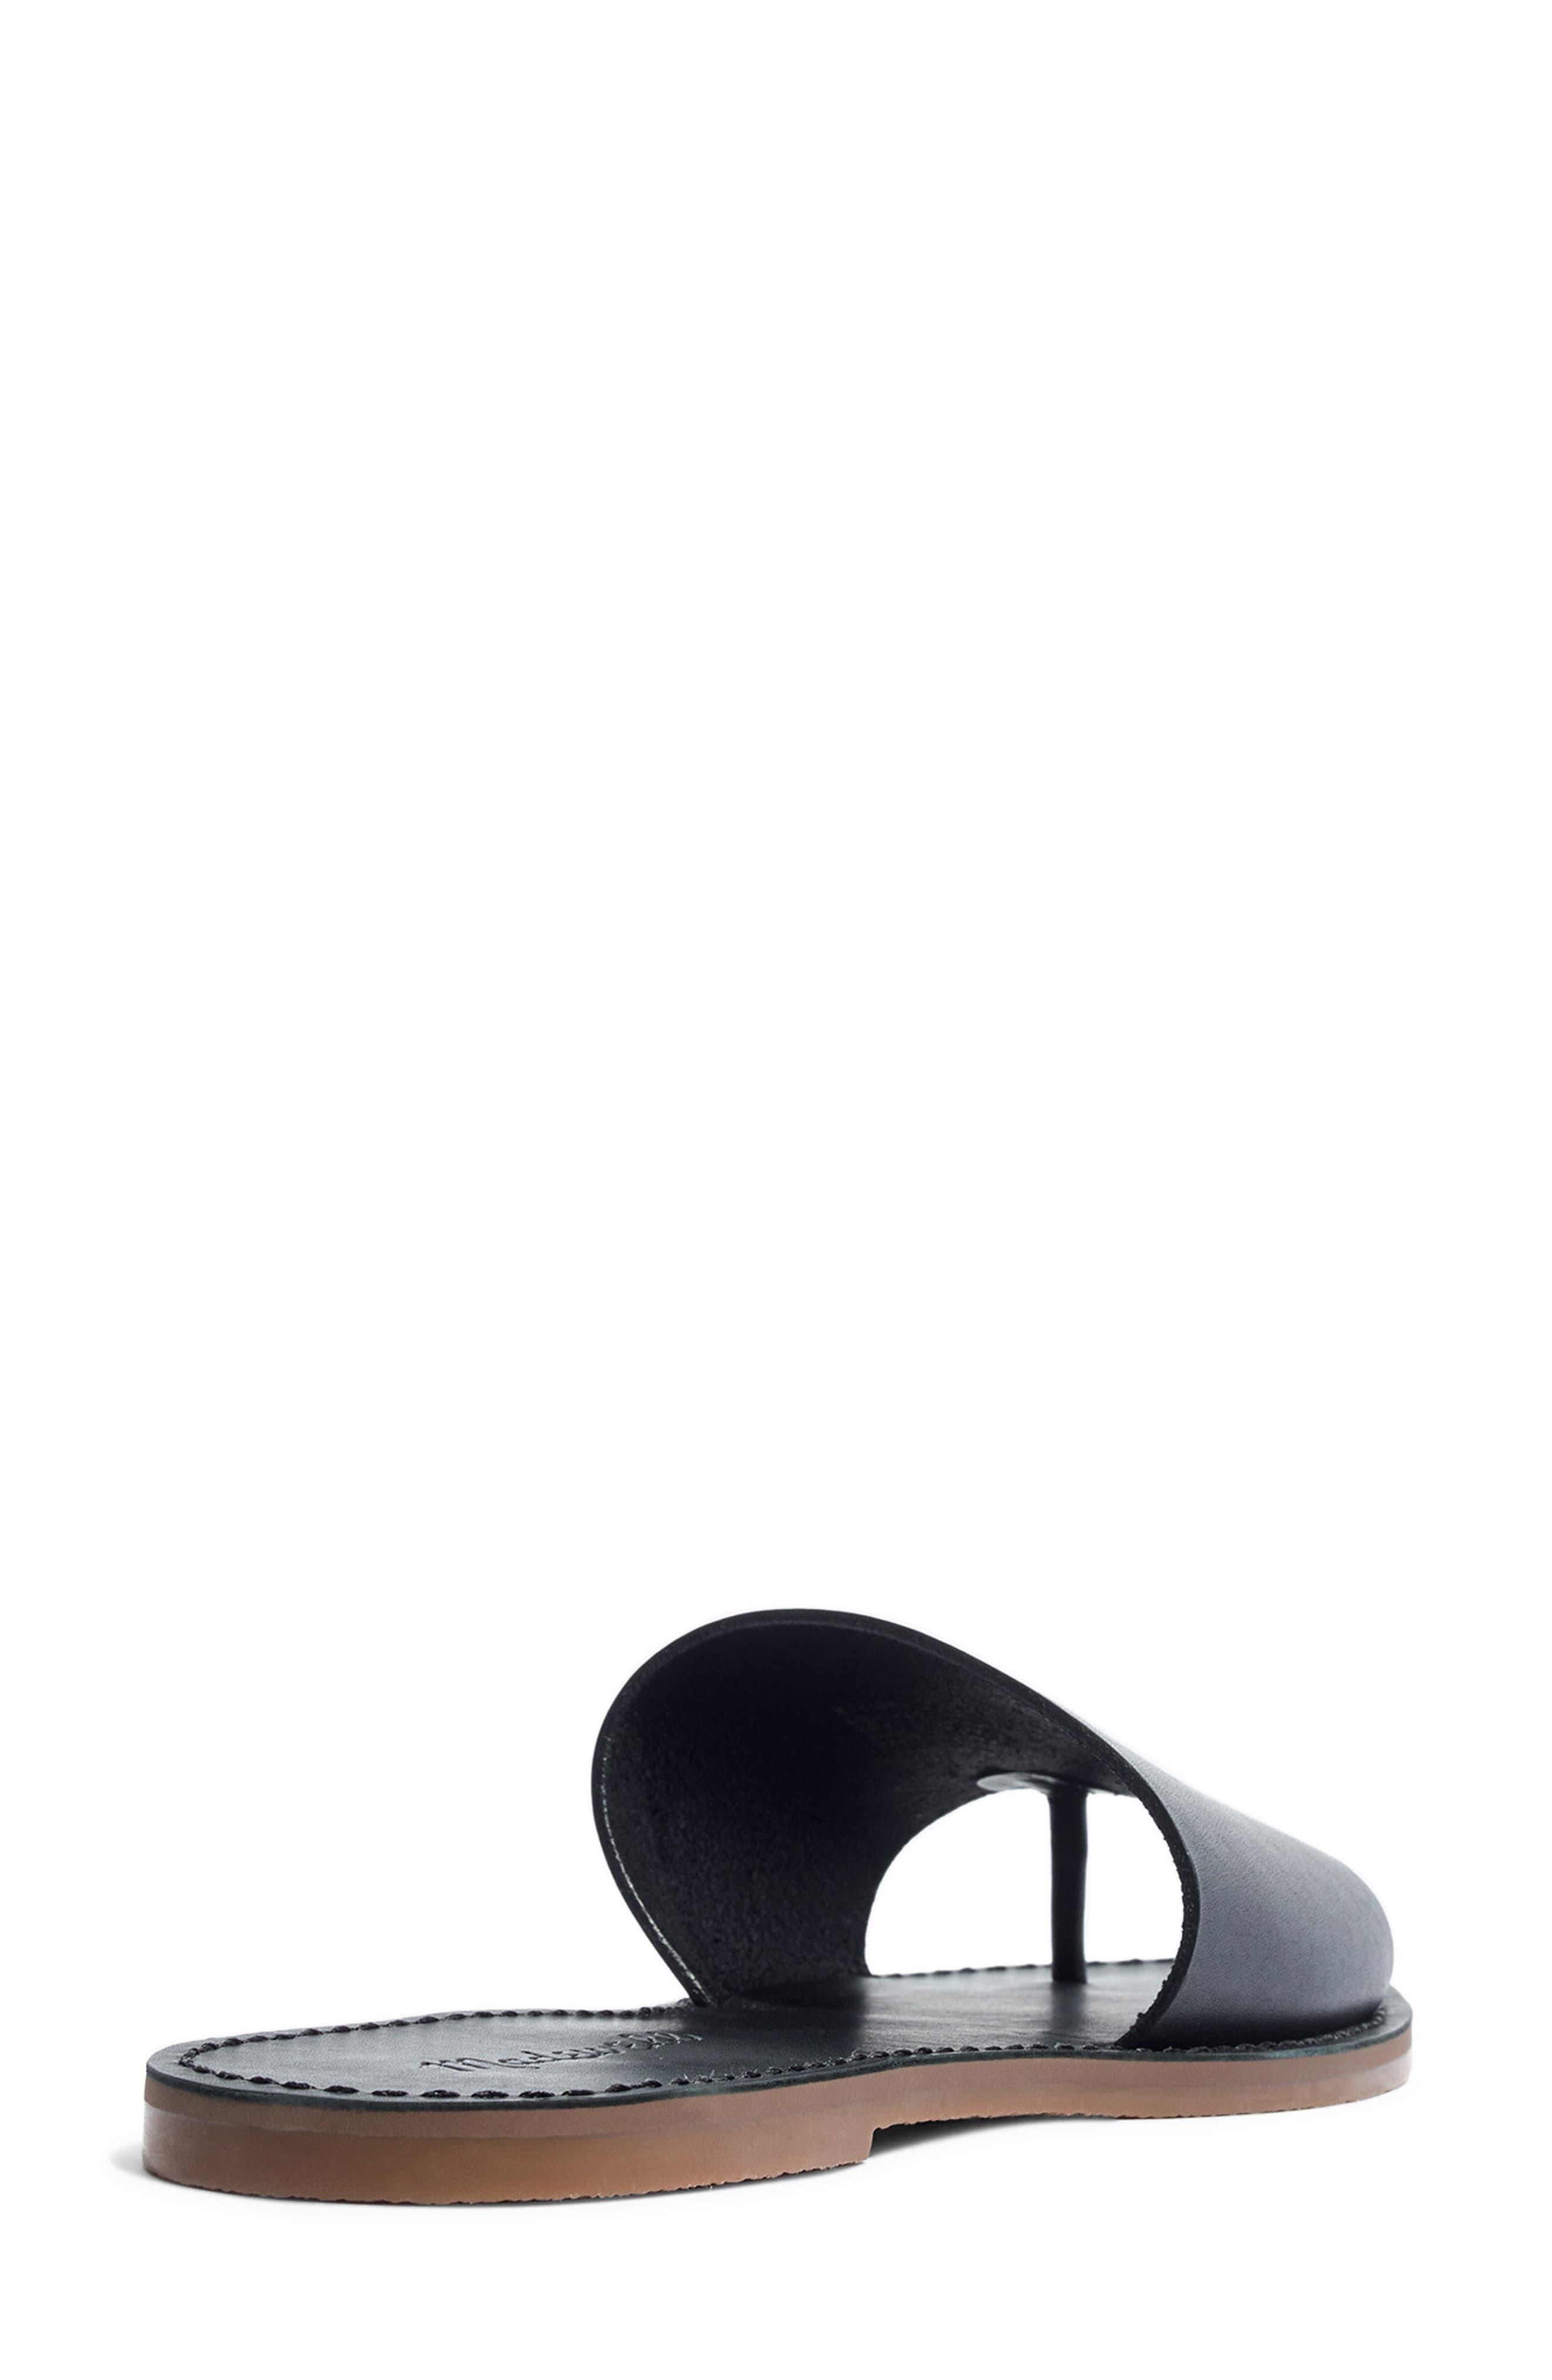 MADEWELL, Boardwalk Post Slide Sandal, Alternate thumbnail 2, color, TRUE BLACK LEATHER